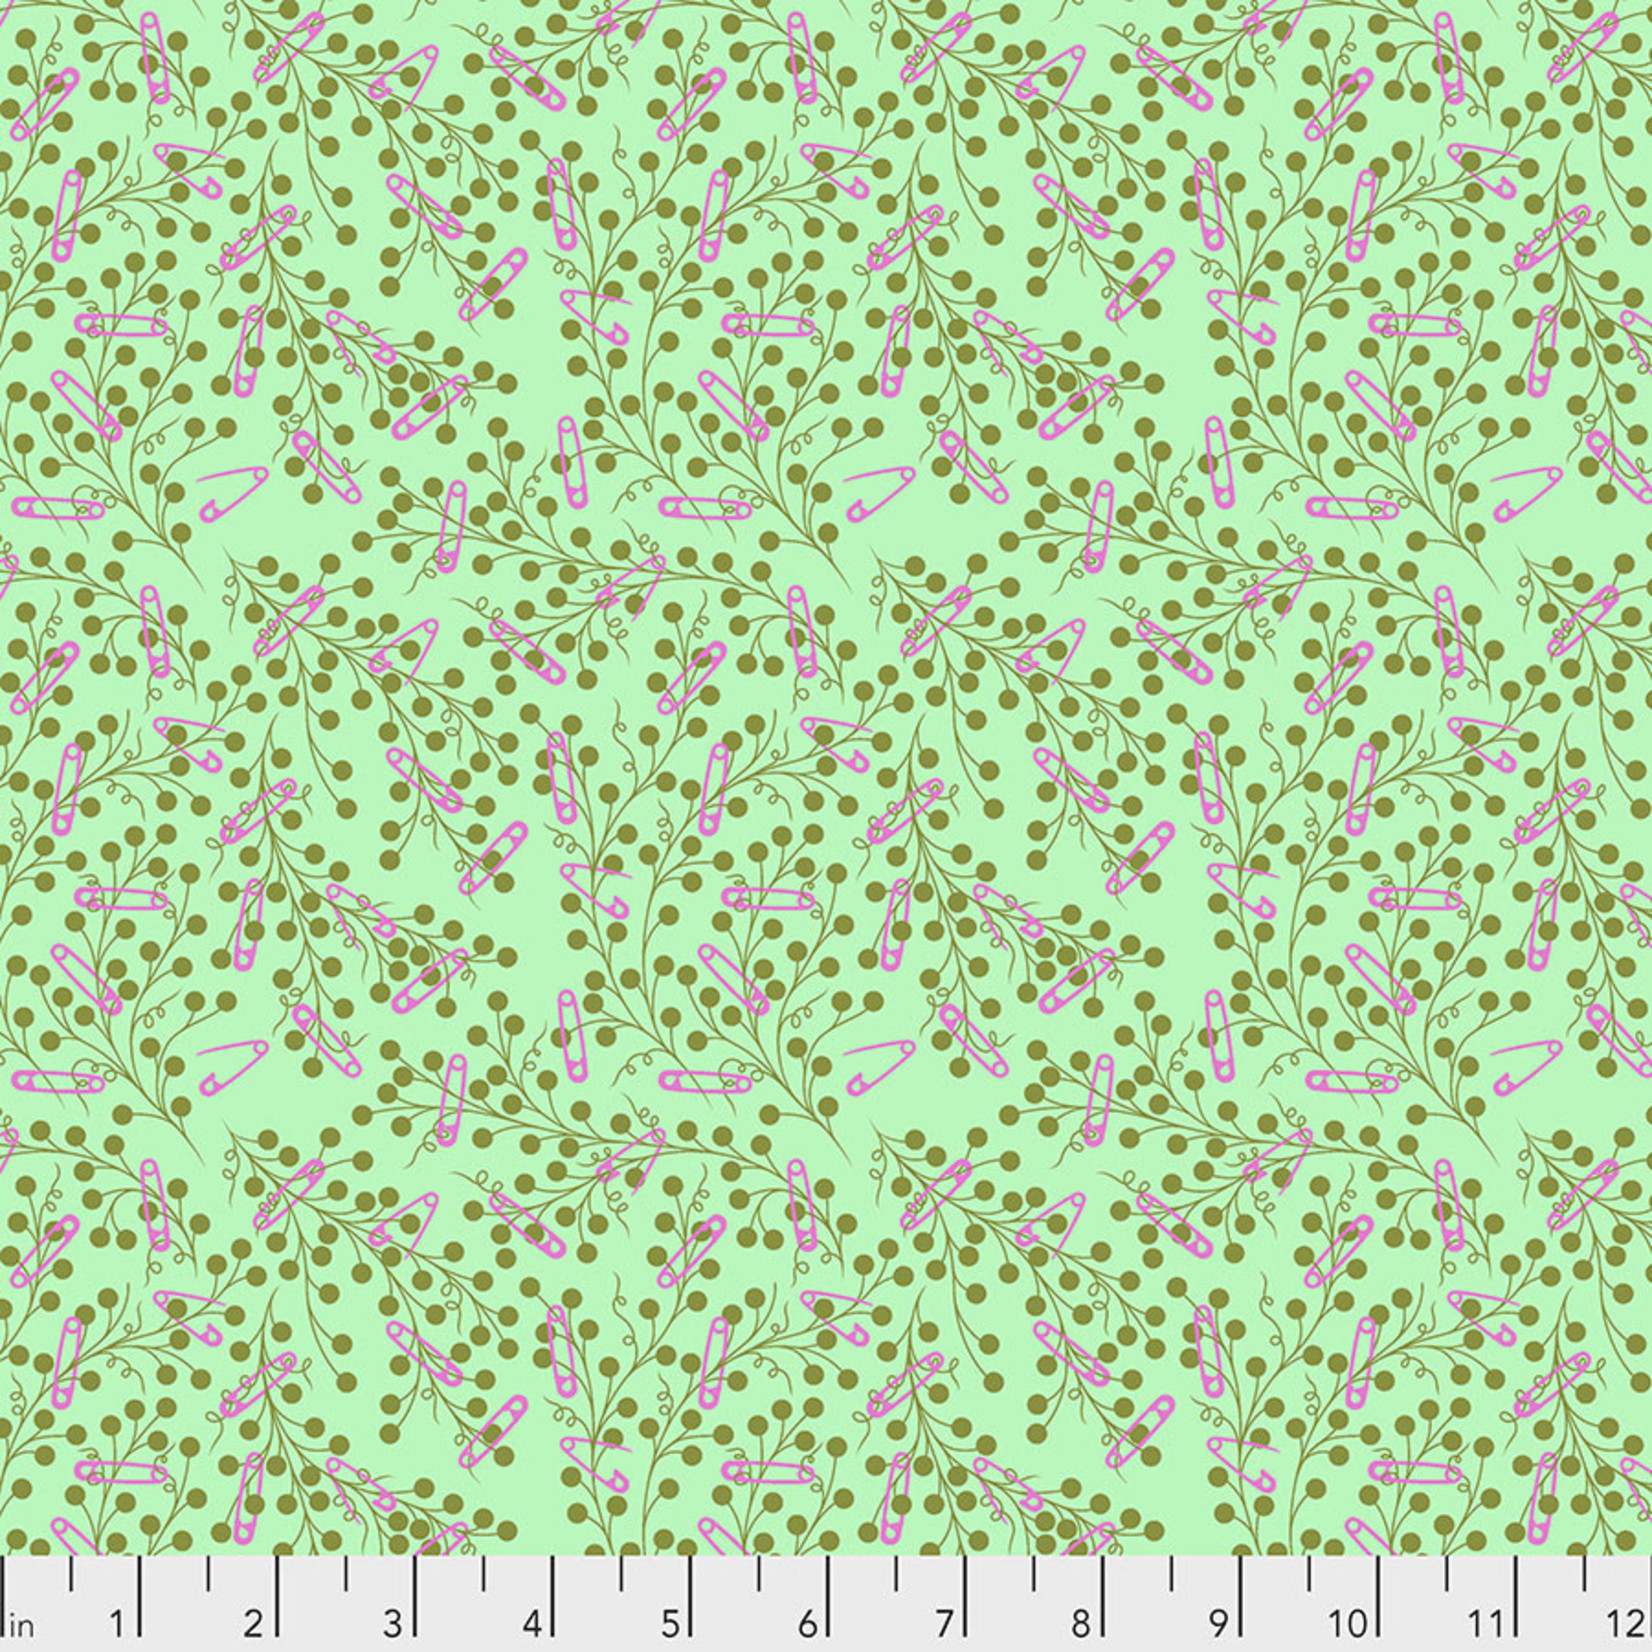 TULA PINK HOMEMADE Pins & Needles - Morning, per cm or $17/m